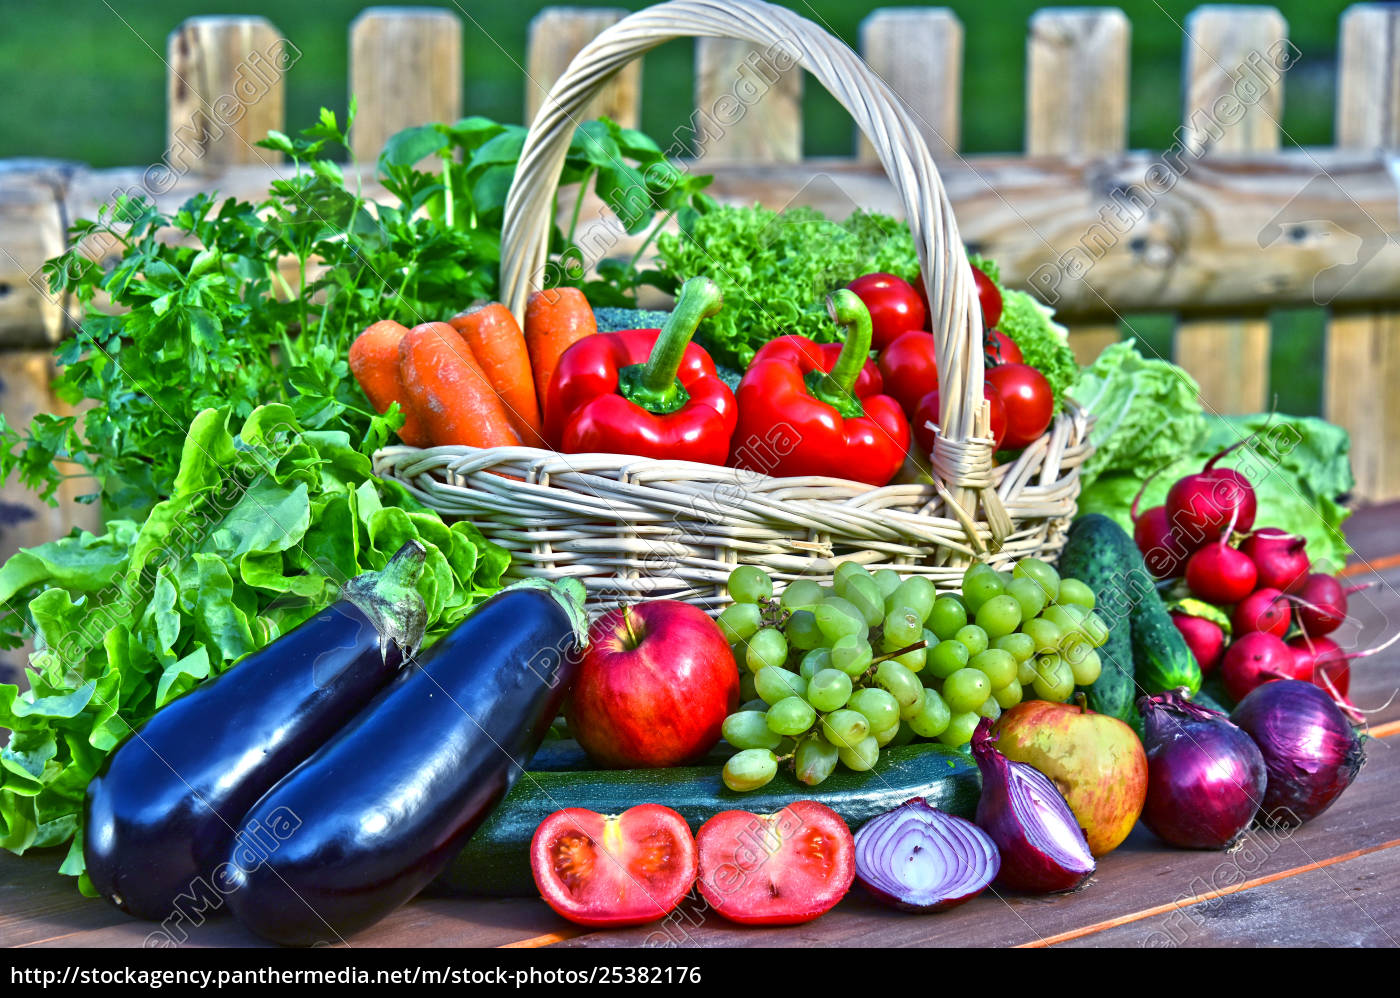 54327c7b4f42 Stockphoto 25382176 - variedad de verduras frescas orgánicas en cesta de  mimbre